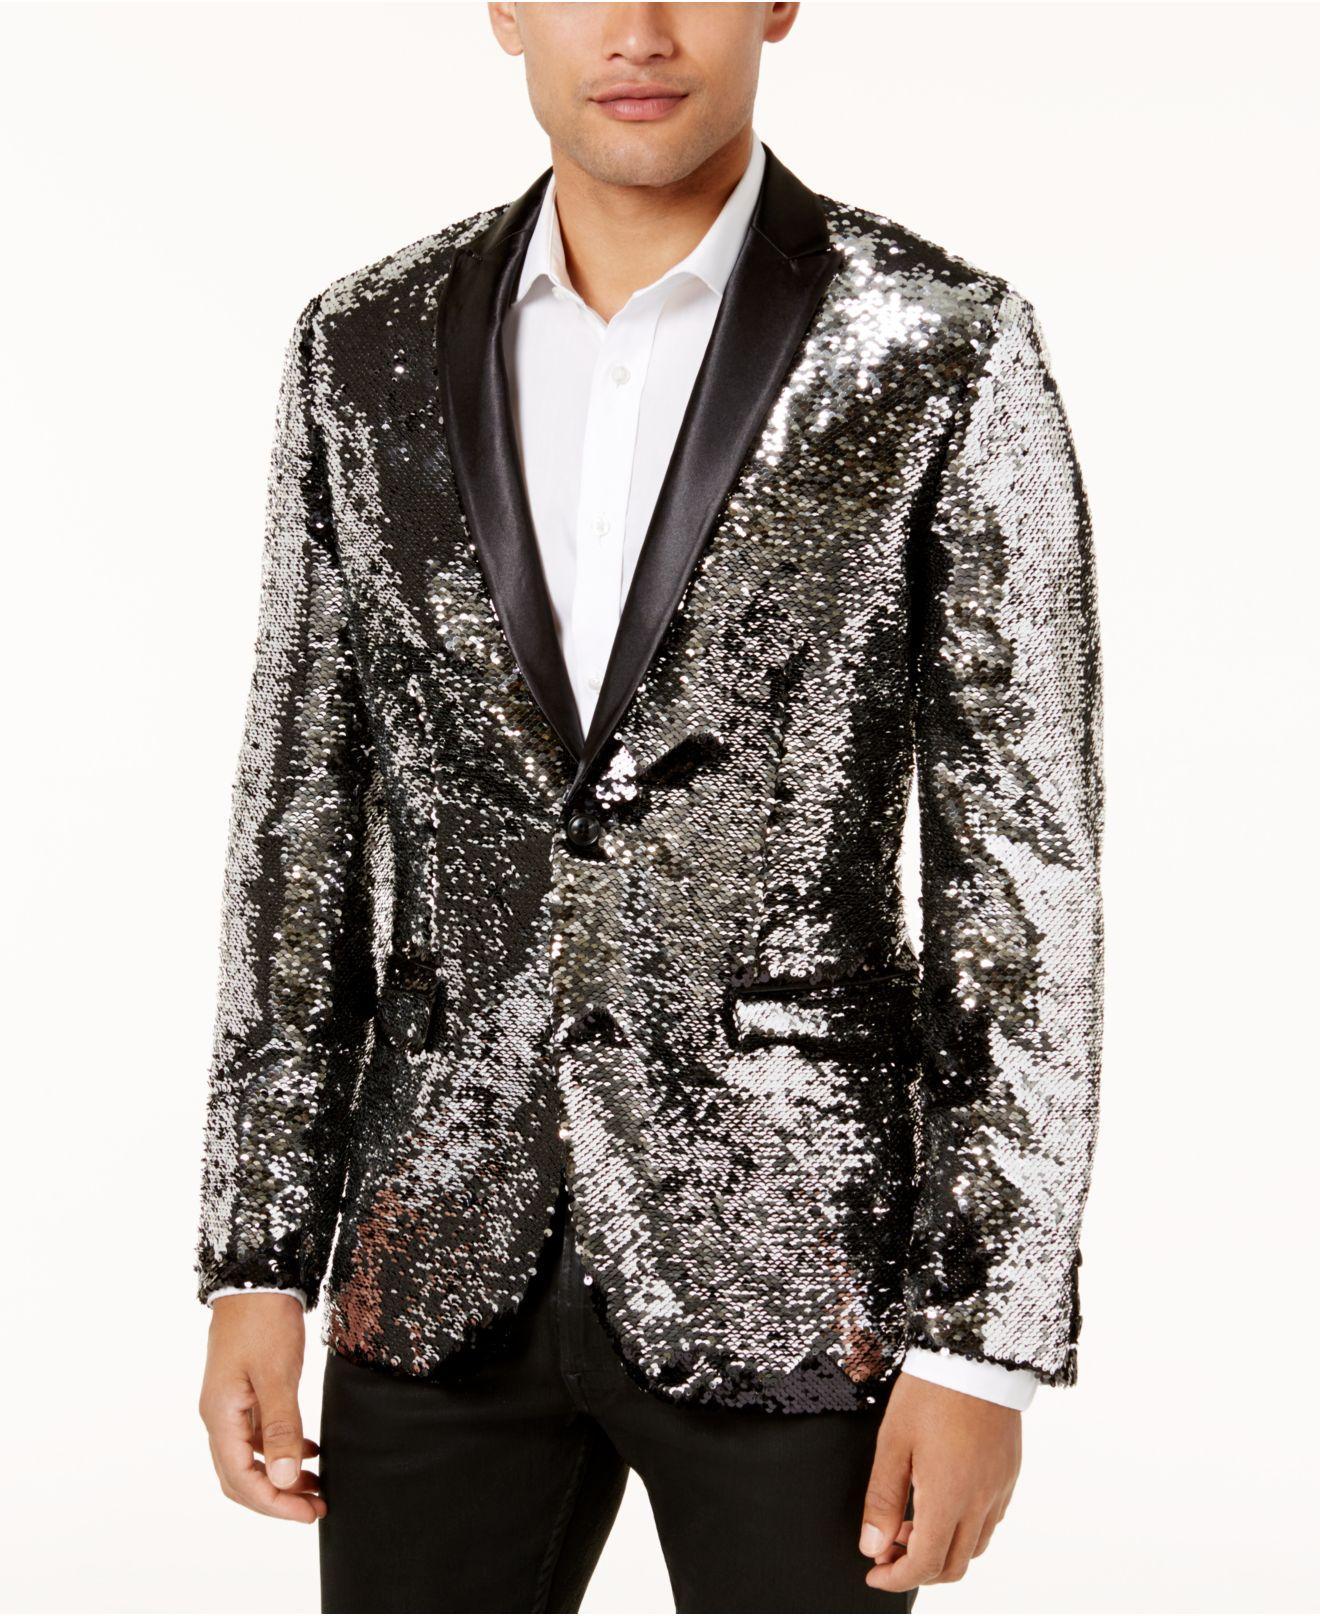 Mr.Macy Fashion Mens Summer Casual Slim Patchwork Sleeveless Vest Tank Top Blouse